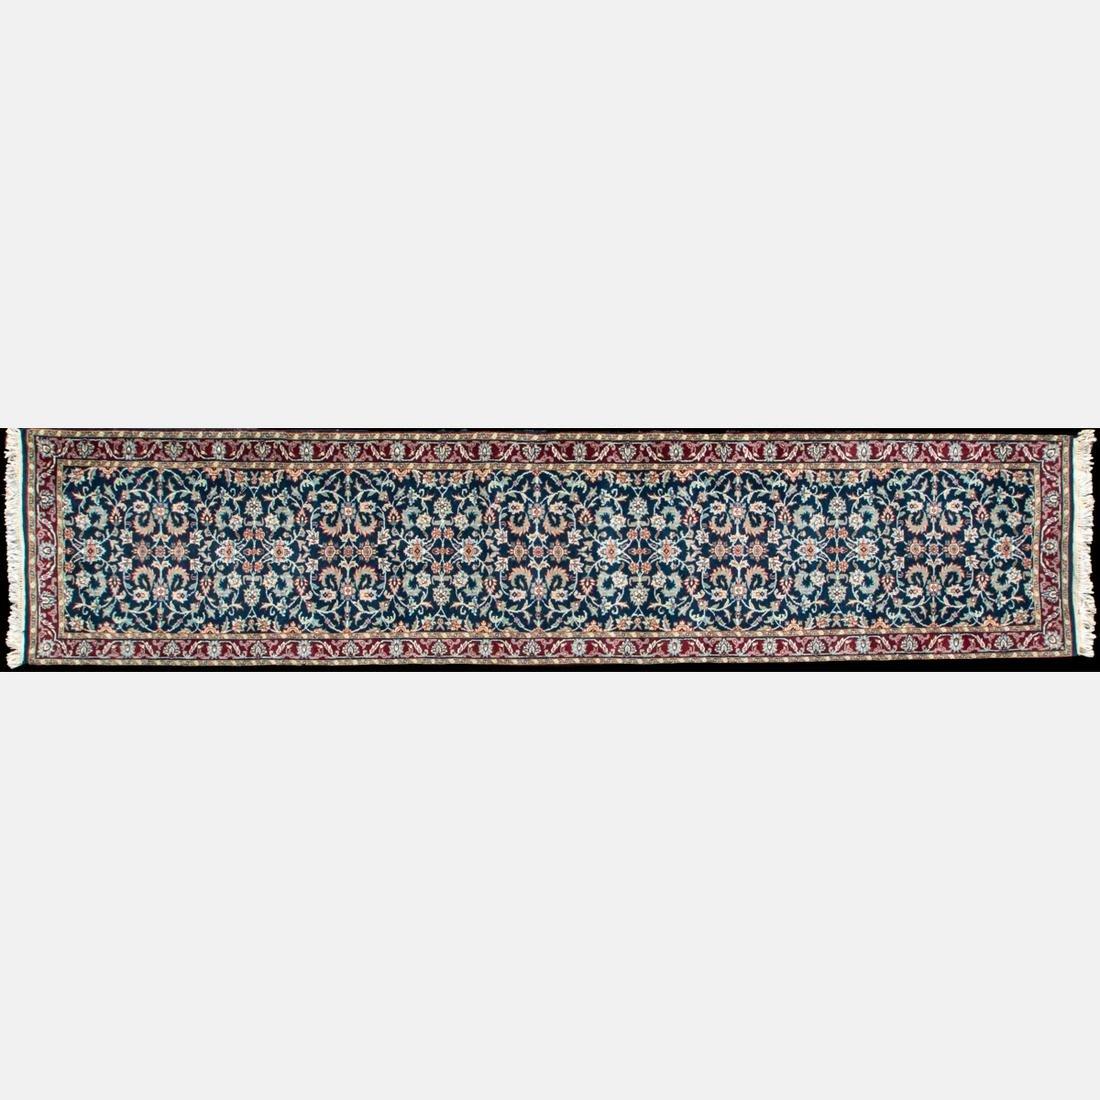 A Persian Wool Runner, 20th Century,